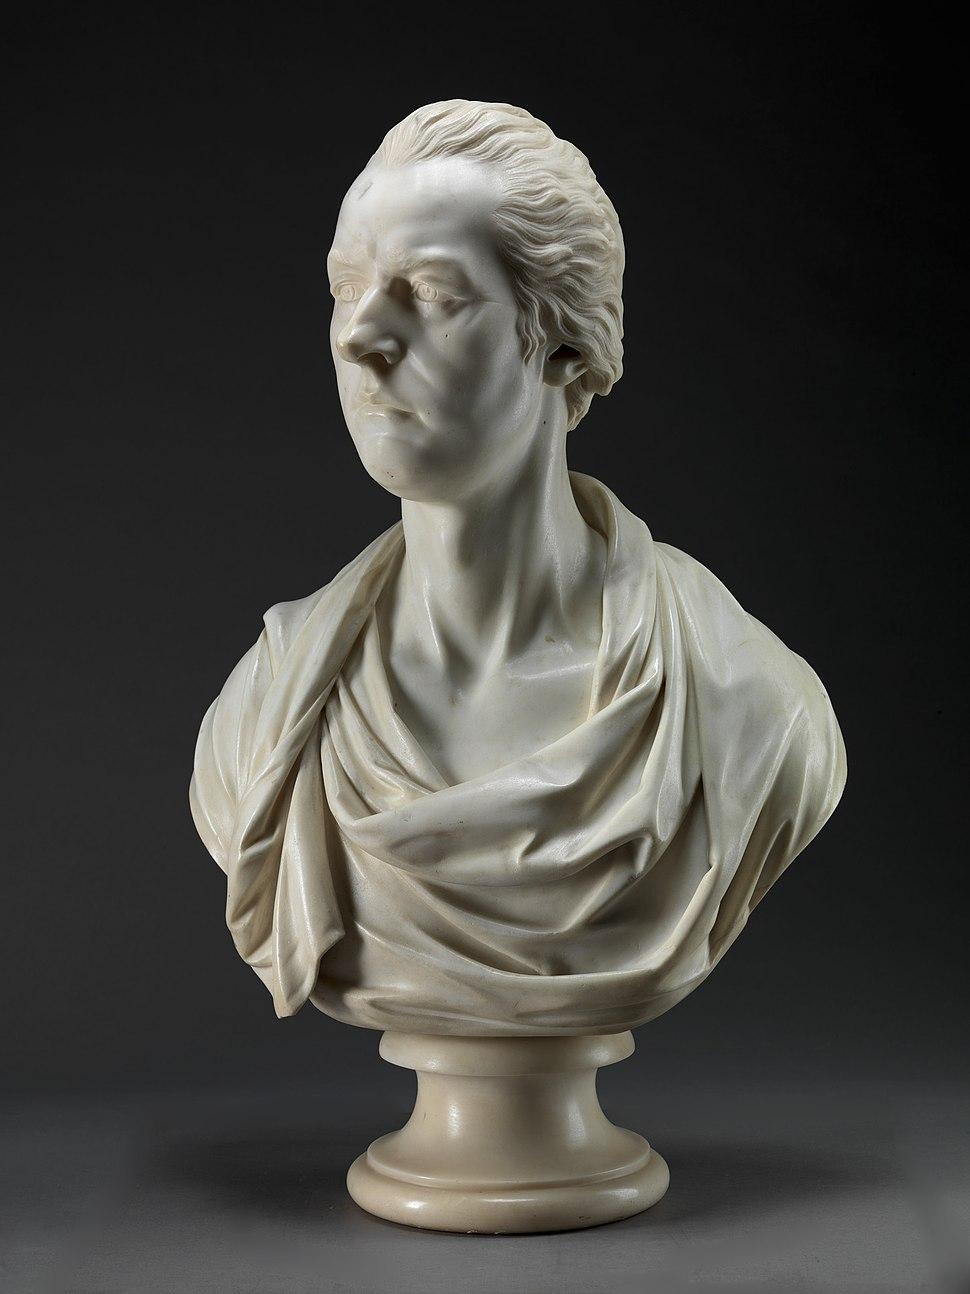 William Pitt by Joseph Nollekens 1807